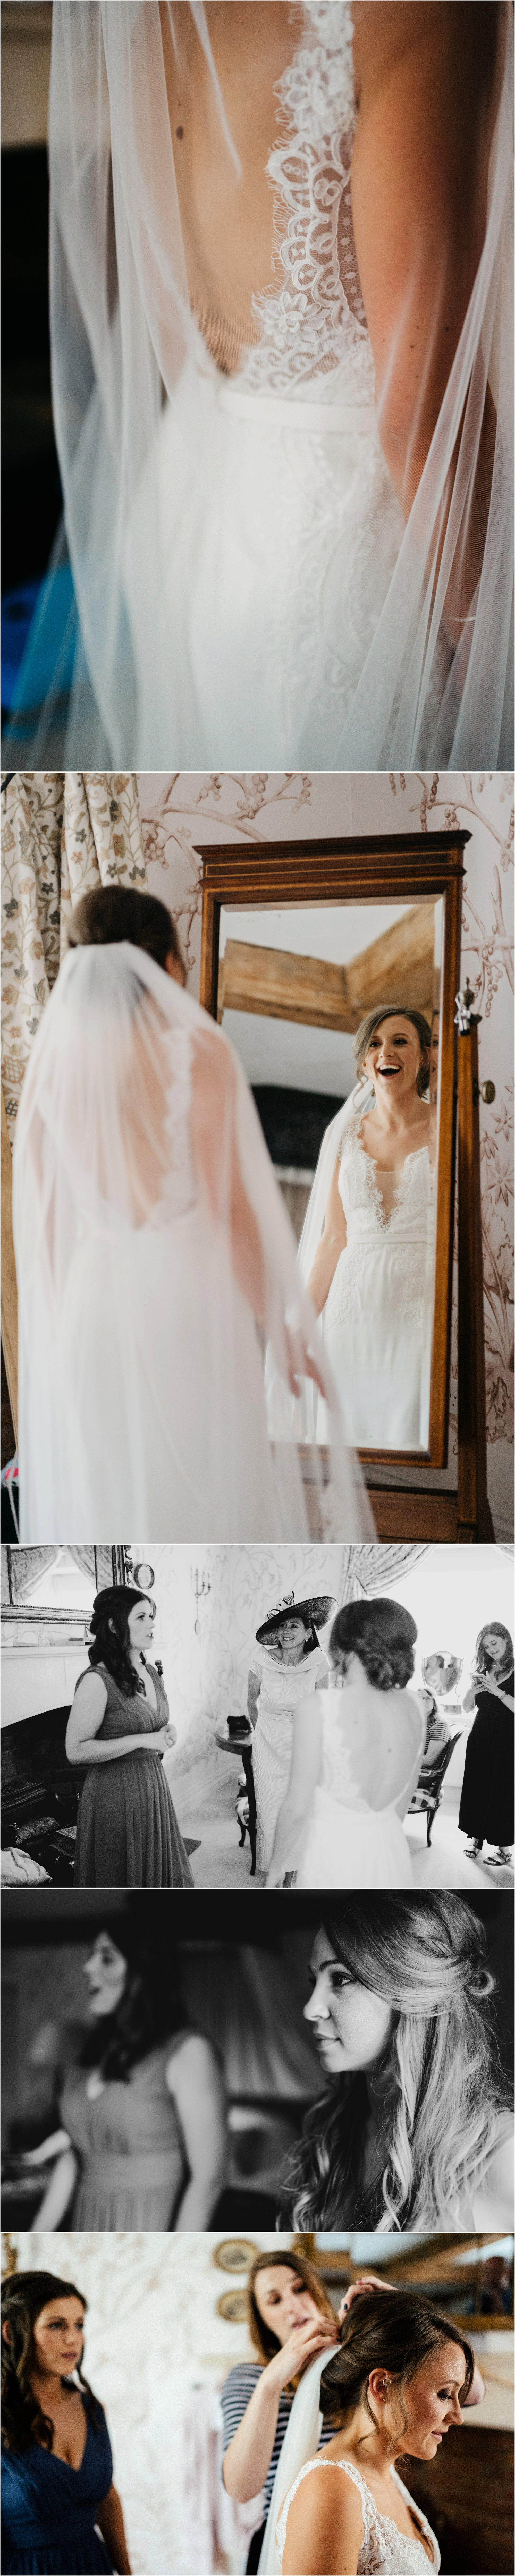 Dewsall Court Herefordshire wedding photographer_0026.jpg